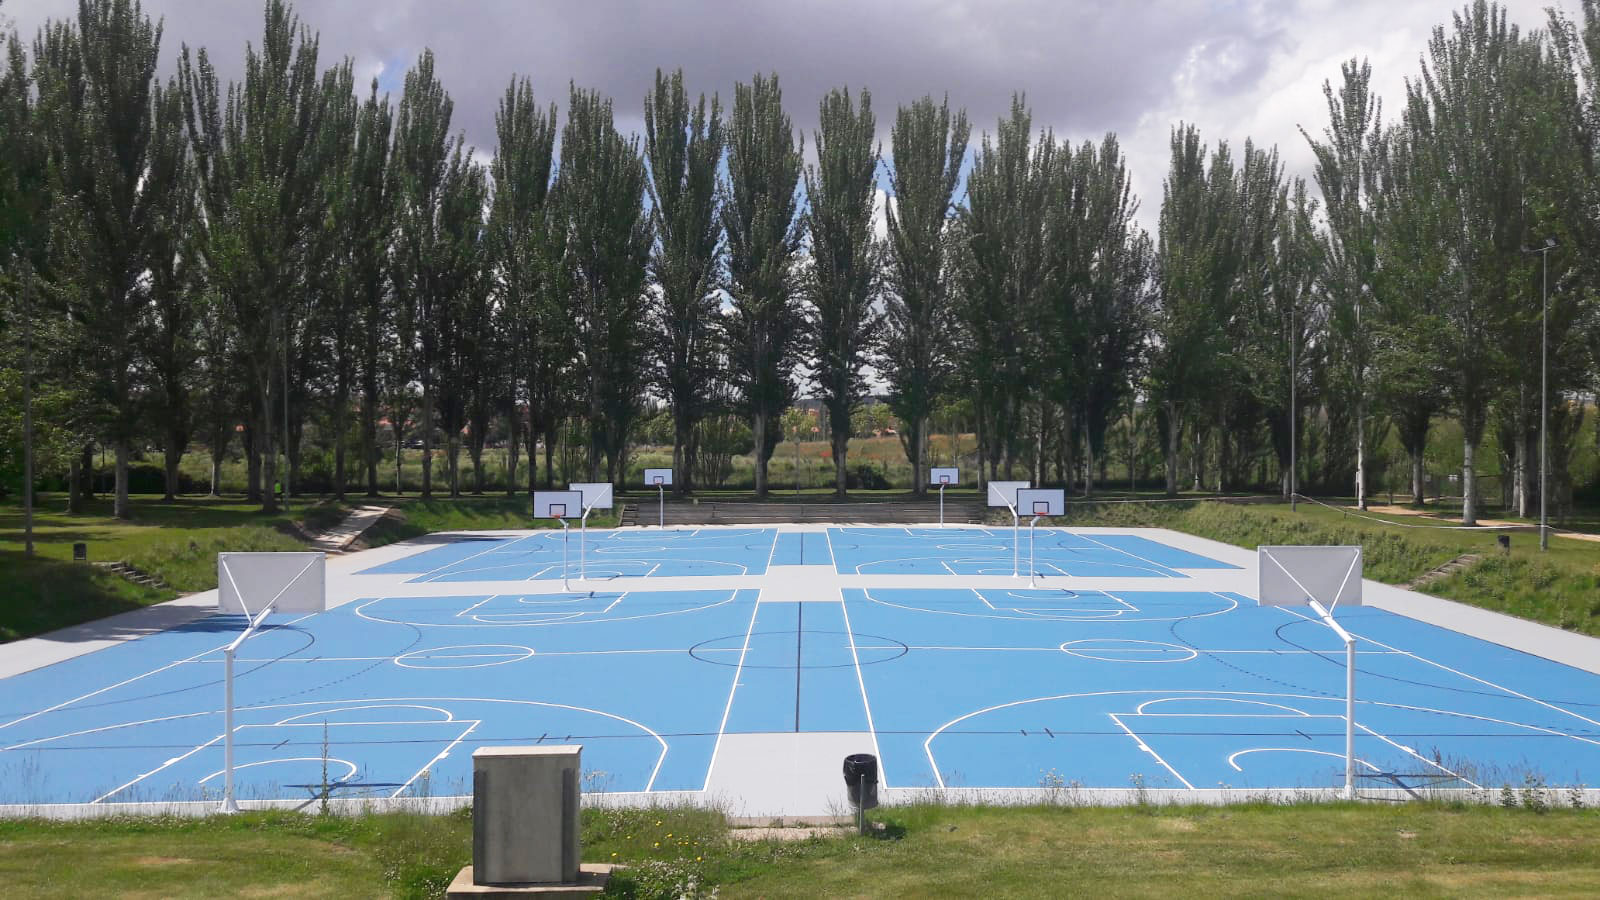 Complejo Deportivo Salas Bajas,  Salamanca, Spagna